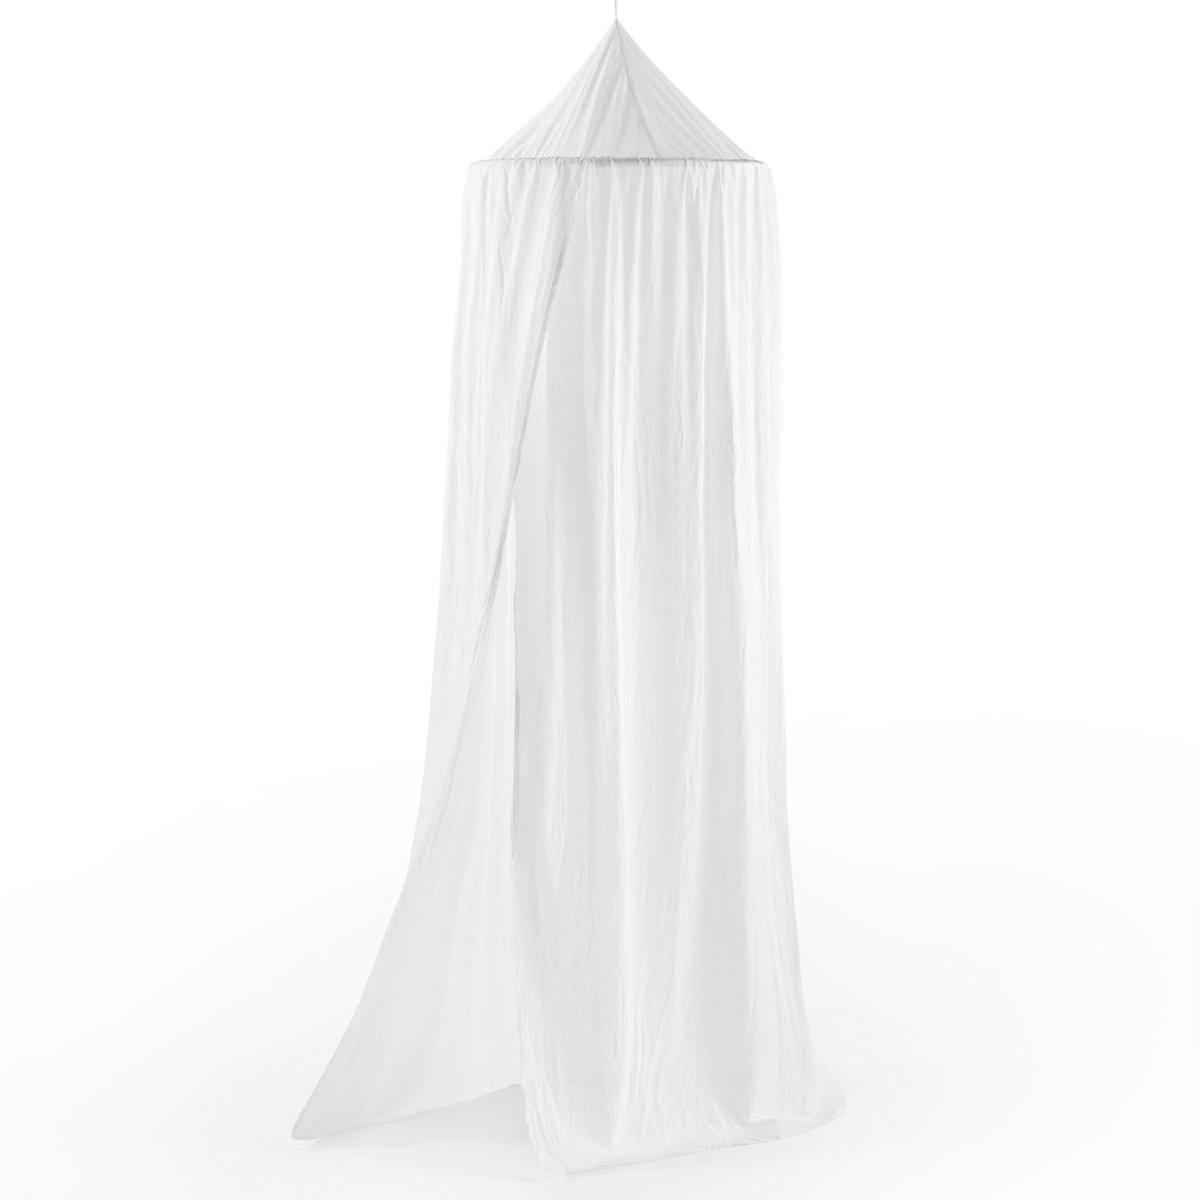 Балдахин La Redoute Над кроватью Volute 50 x 260 см белый